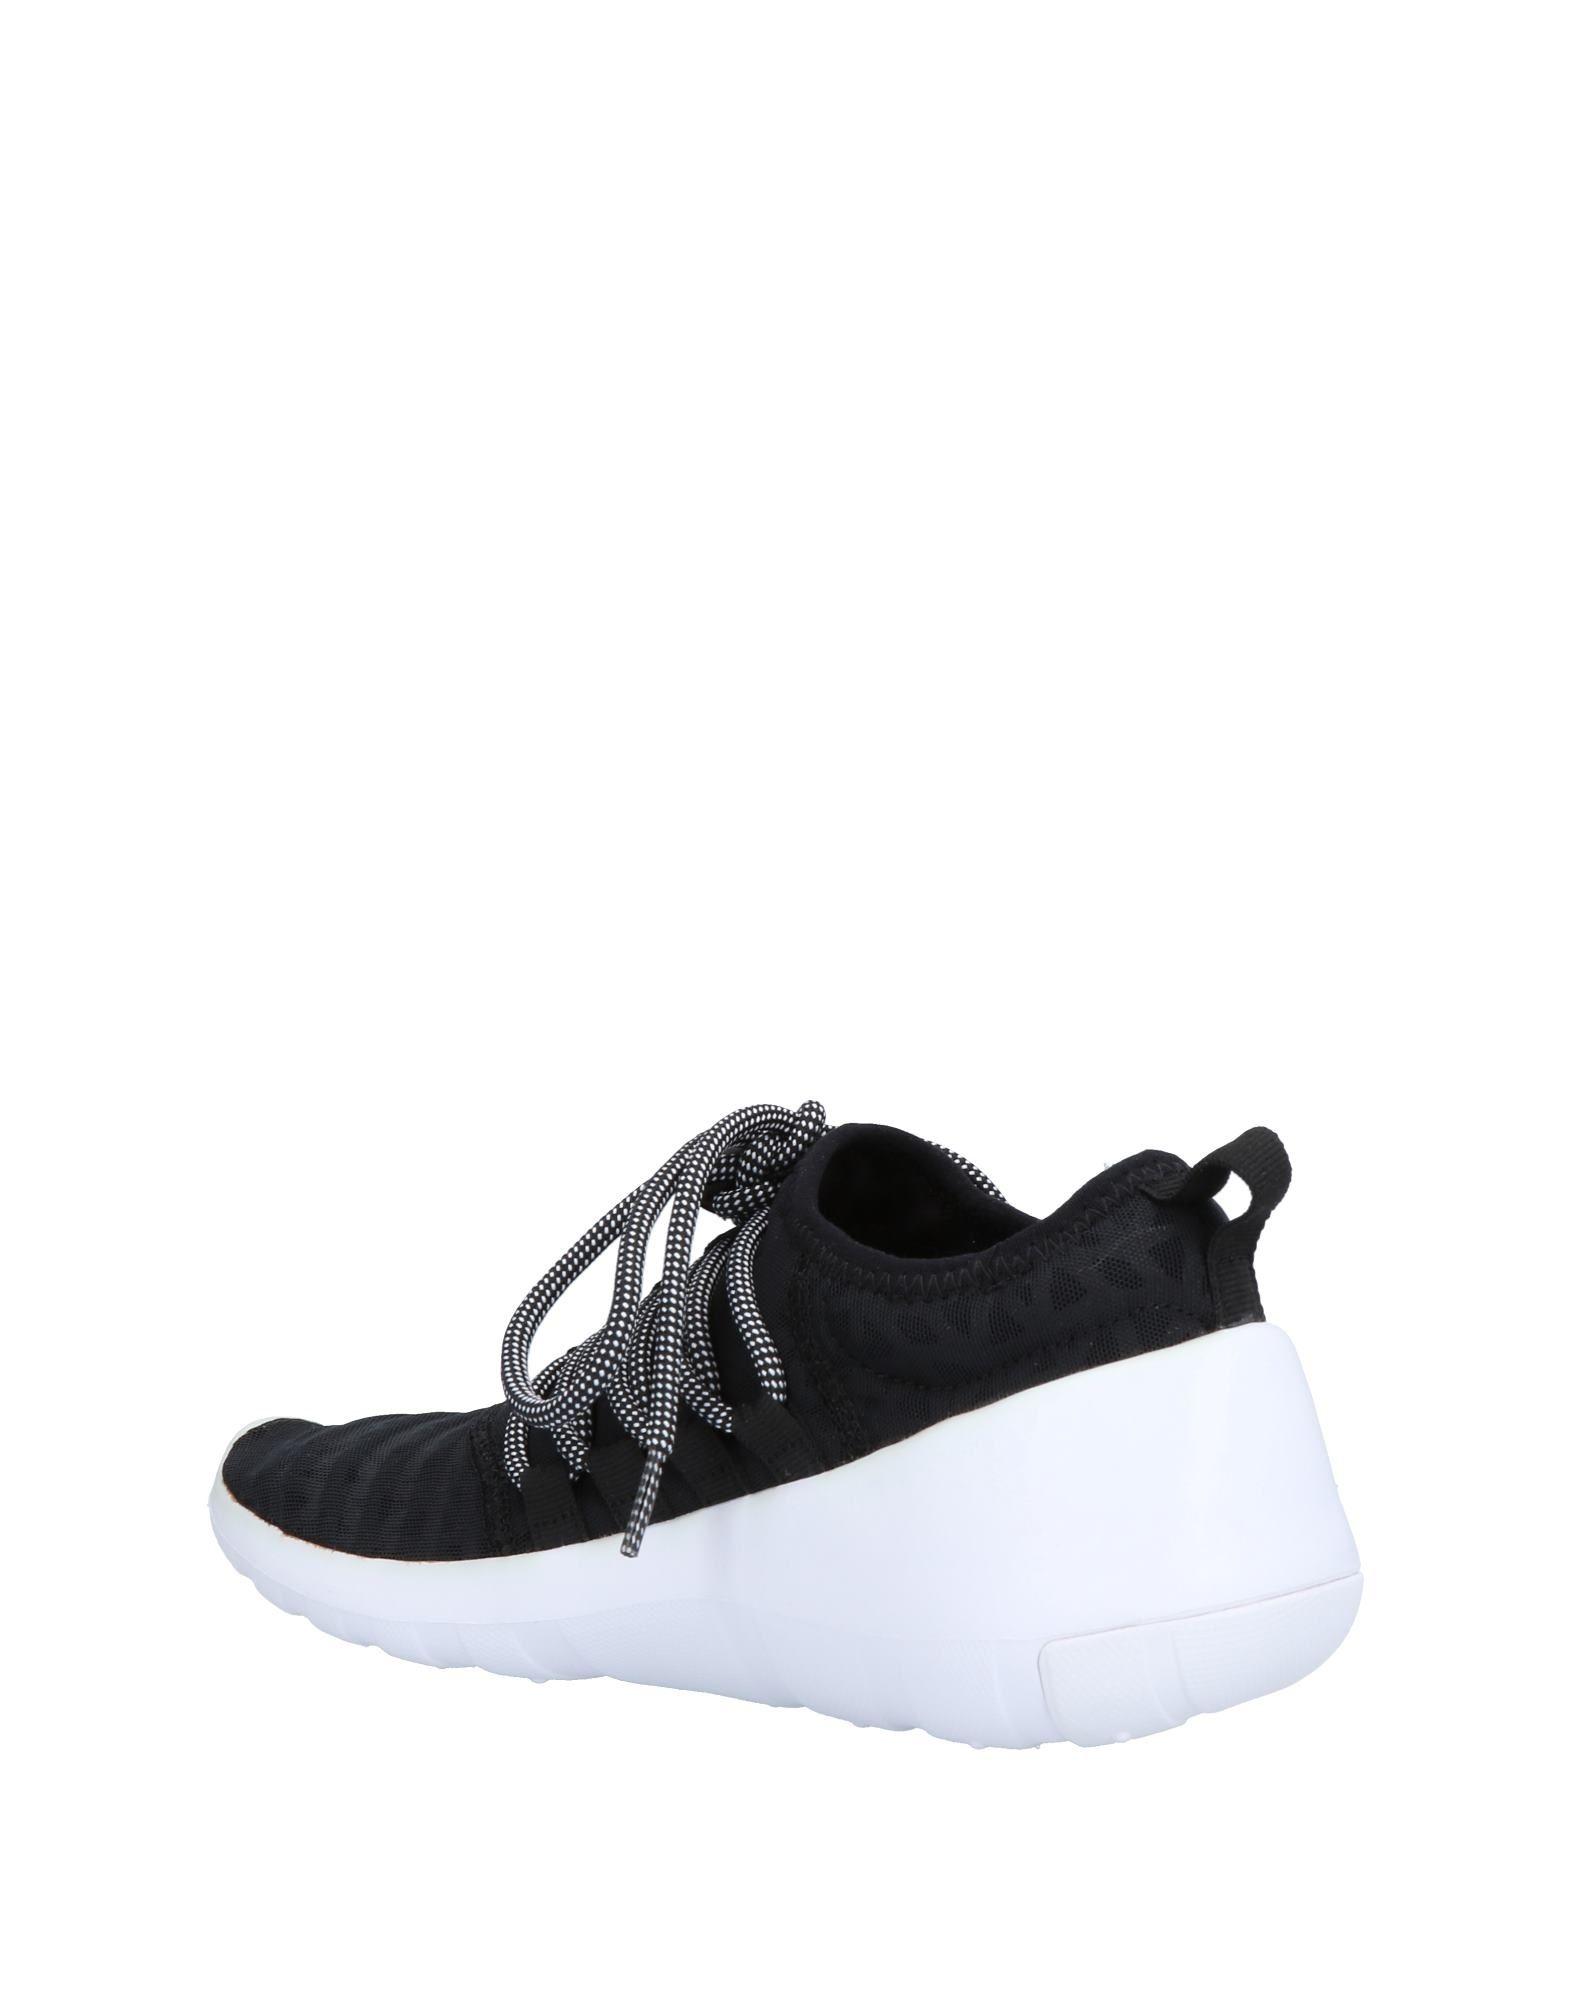 Nike Sneakers Damen  11503062MD Schuhe Gute Qualität beliebte Schuhe 11503062MD 72c196